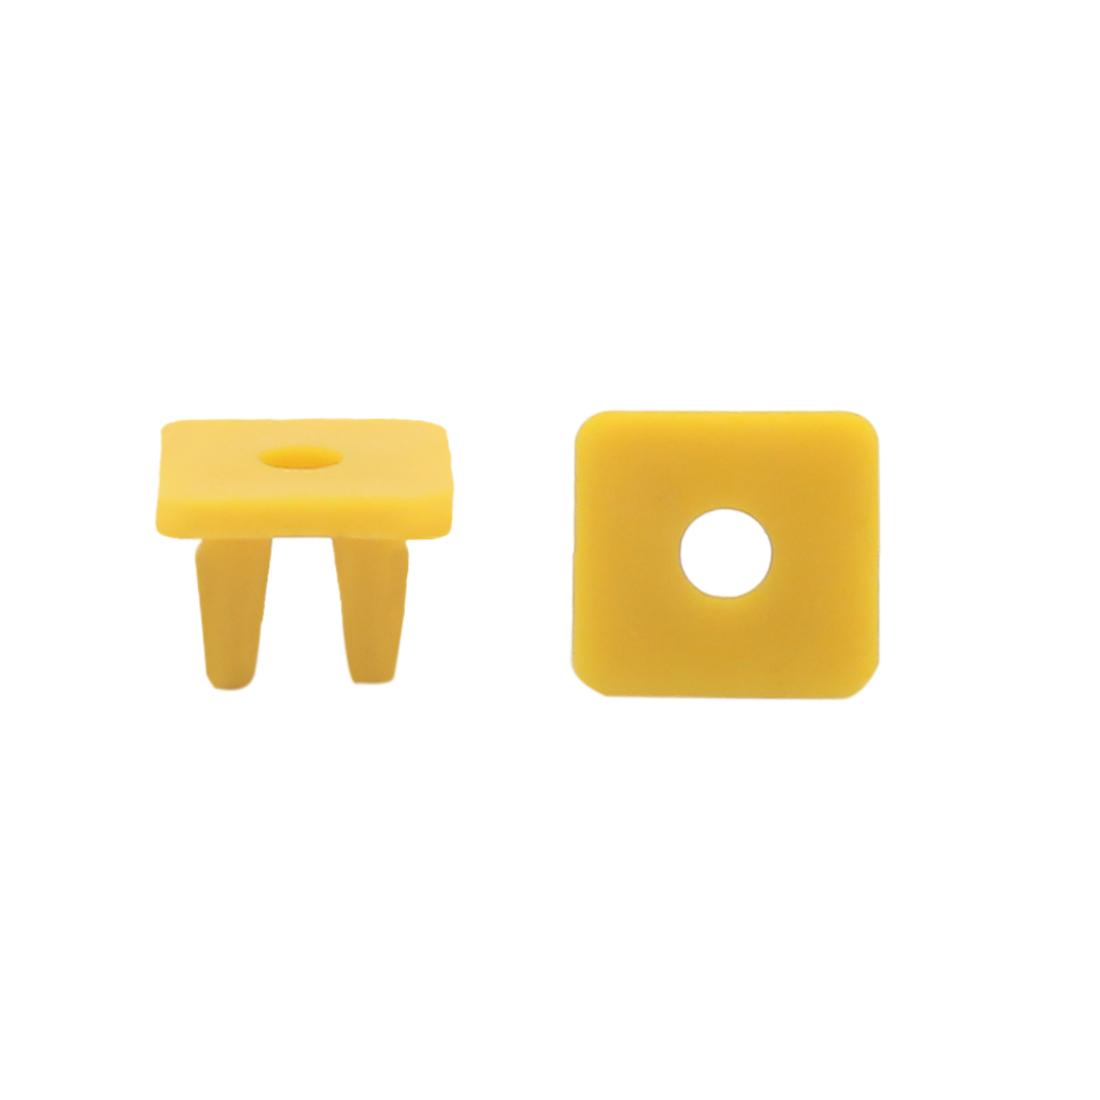 250 Pcs Yellow Plastic Rivets Fastener Retainer Clips for Car Trunk Door Panel